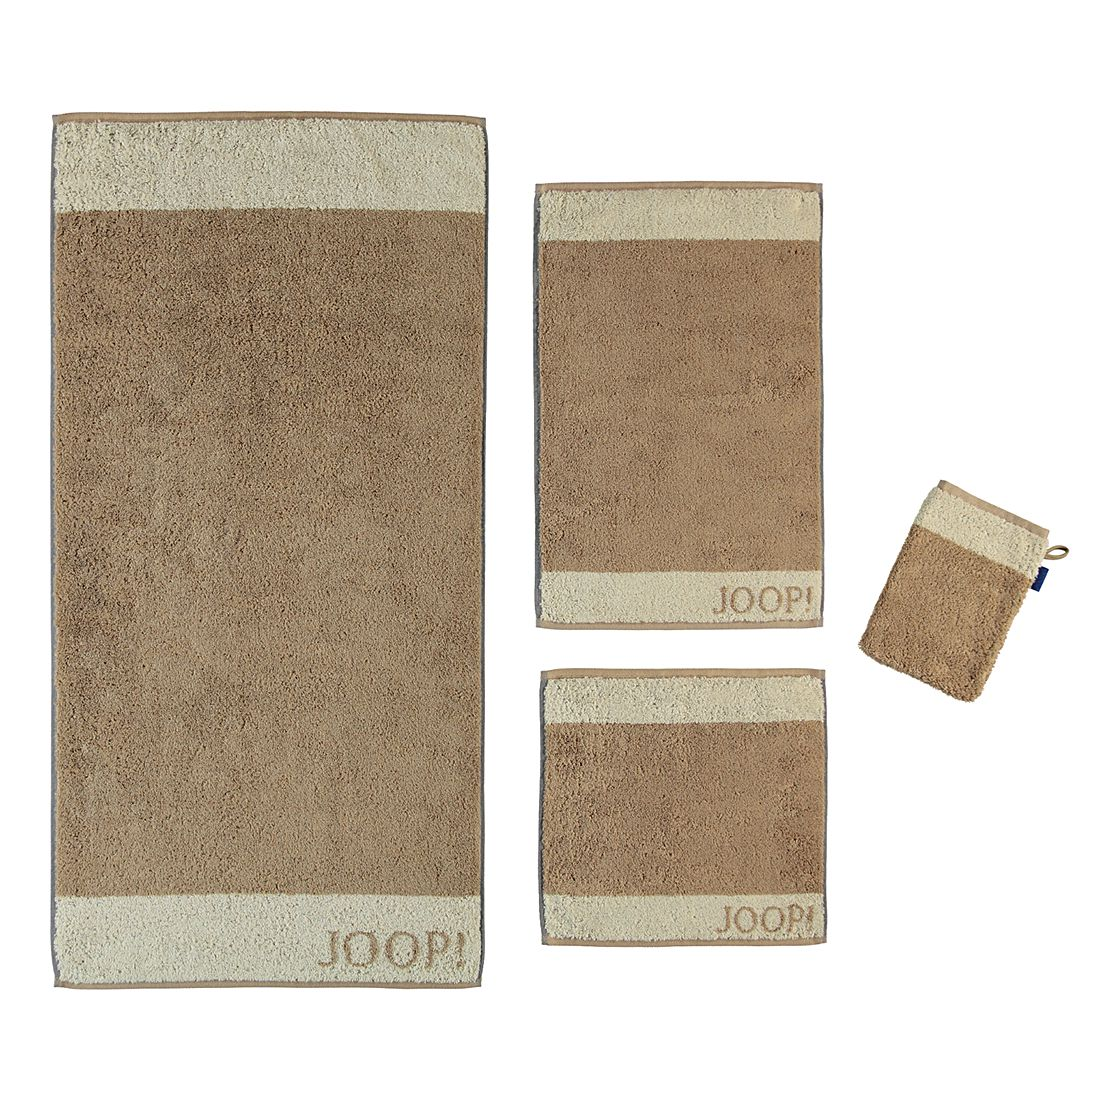 handt cher graphic doubleface 1634 baumwolle piment g stetuch 30x50 cm joop online bestellen. Black Bedroom Furniture Sets. Home Design Ideas